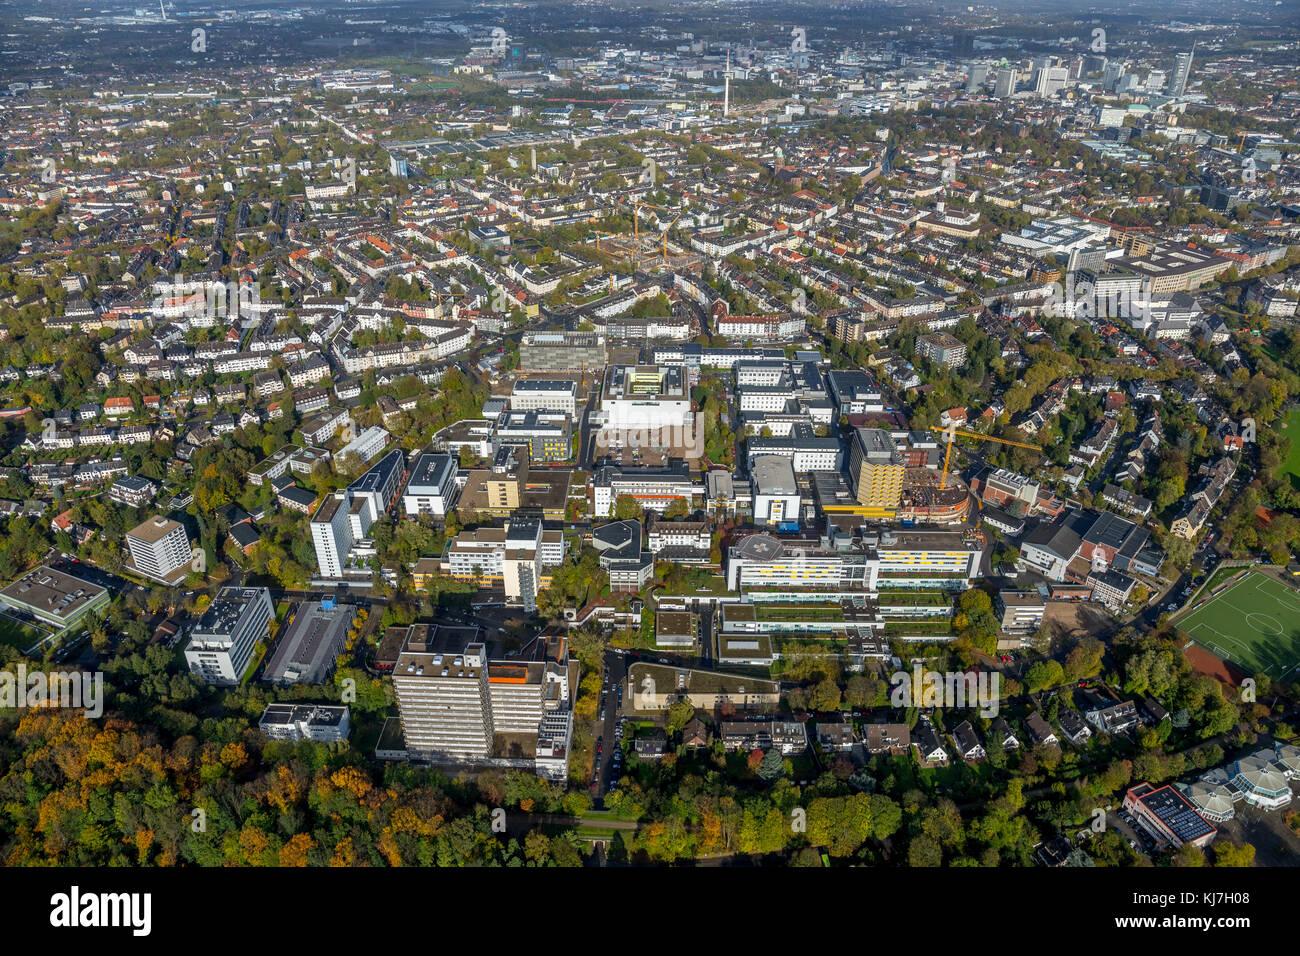 University Hospital Essen, UK Essen, University of Duisburg-Essen, Divisions Cardiovascular Diseases, Transplantation - Stock Image